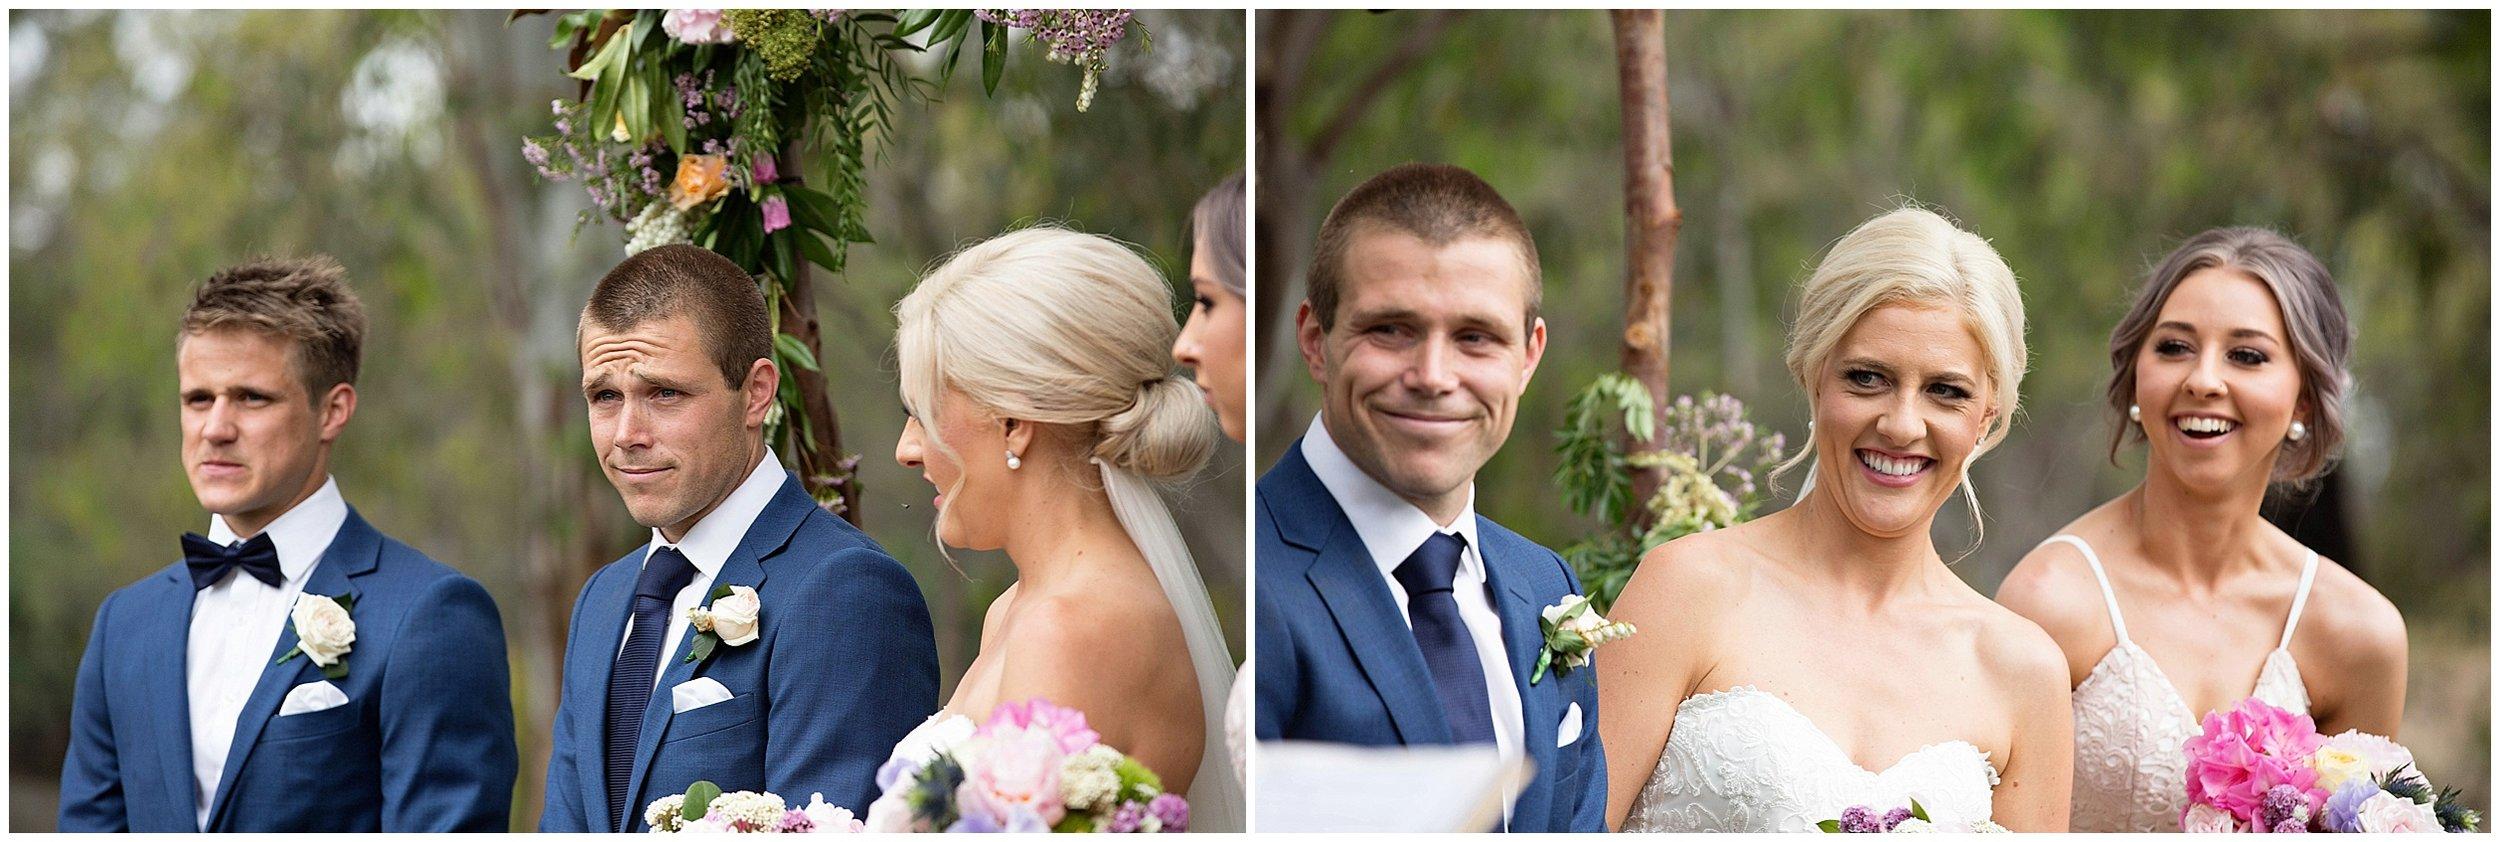 shepparton-wedding-photographer_0190.jpg